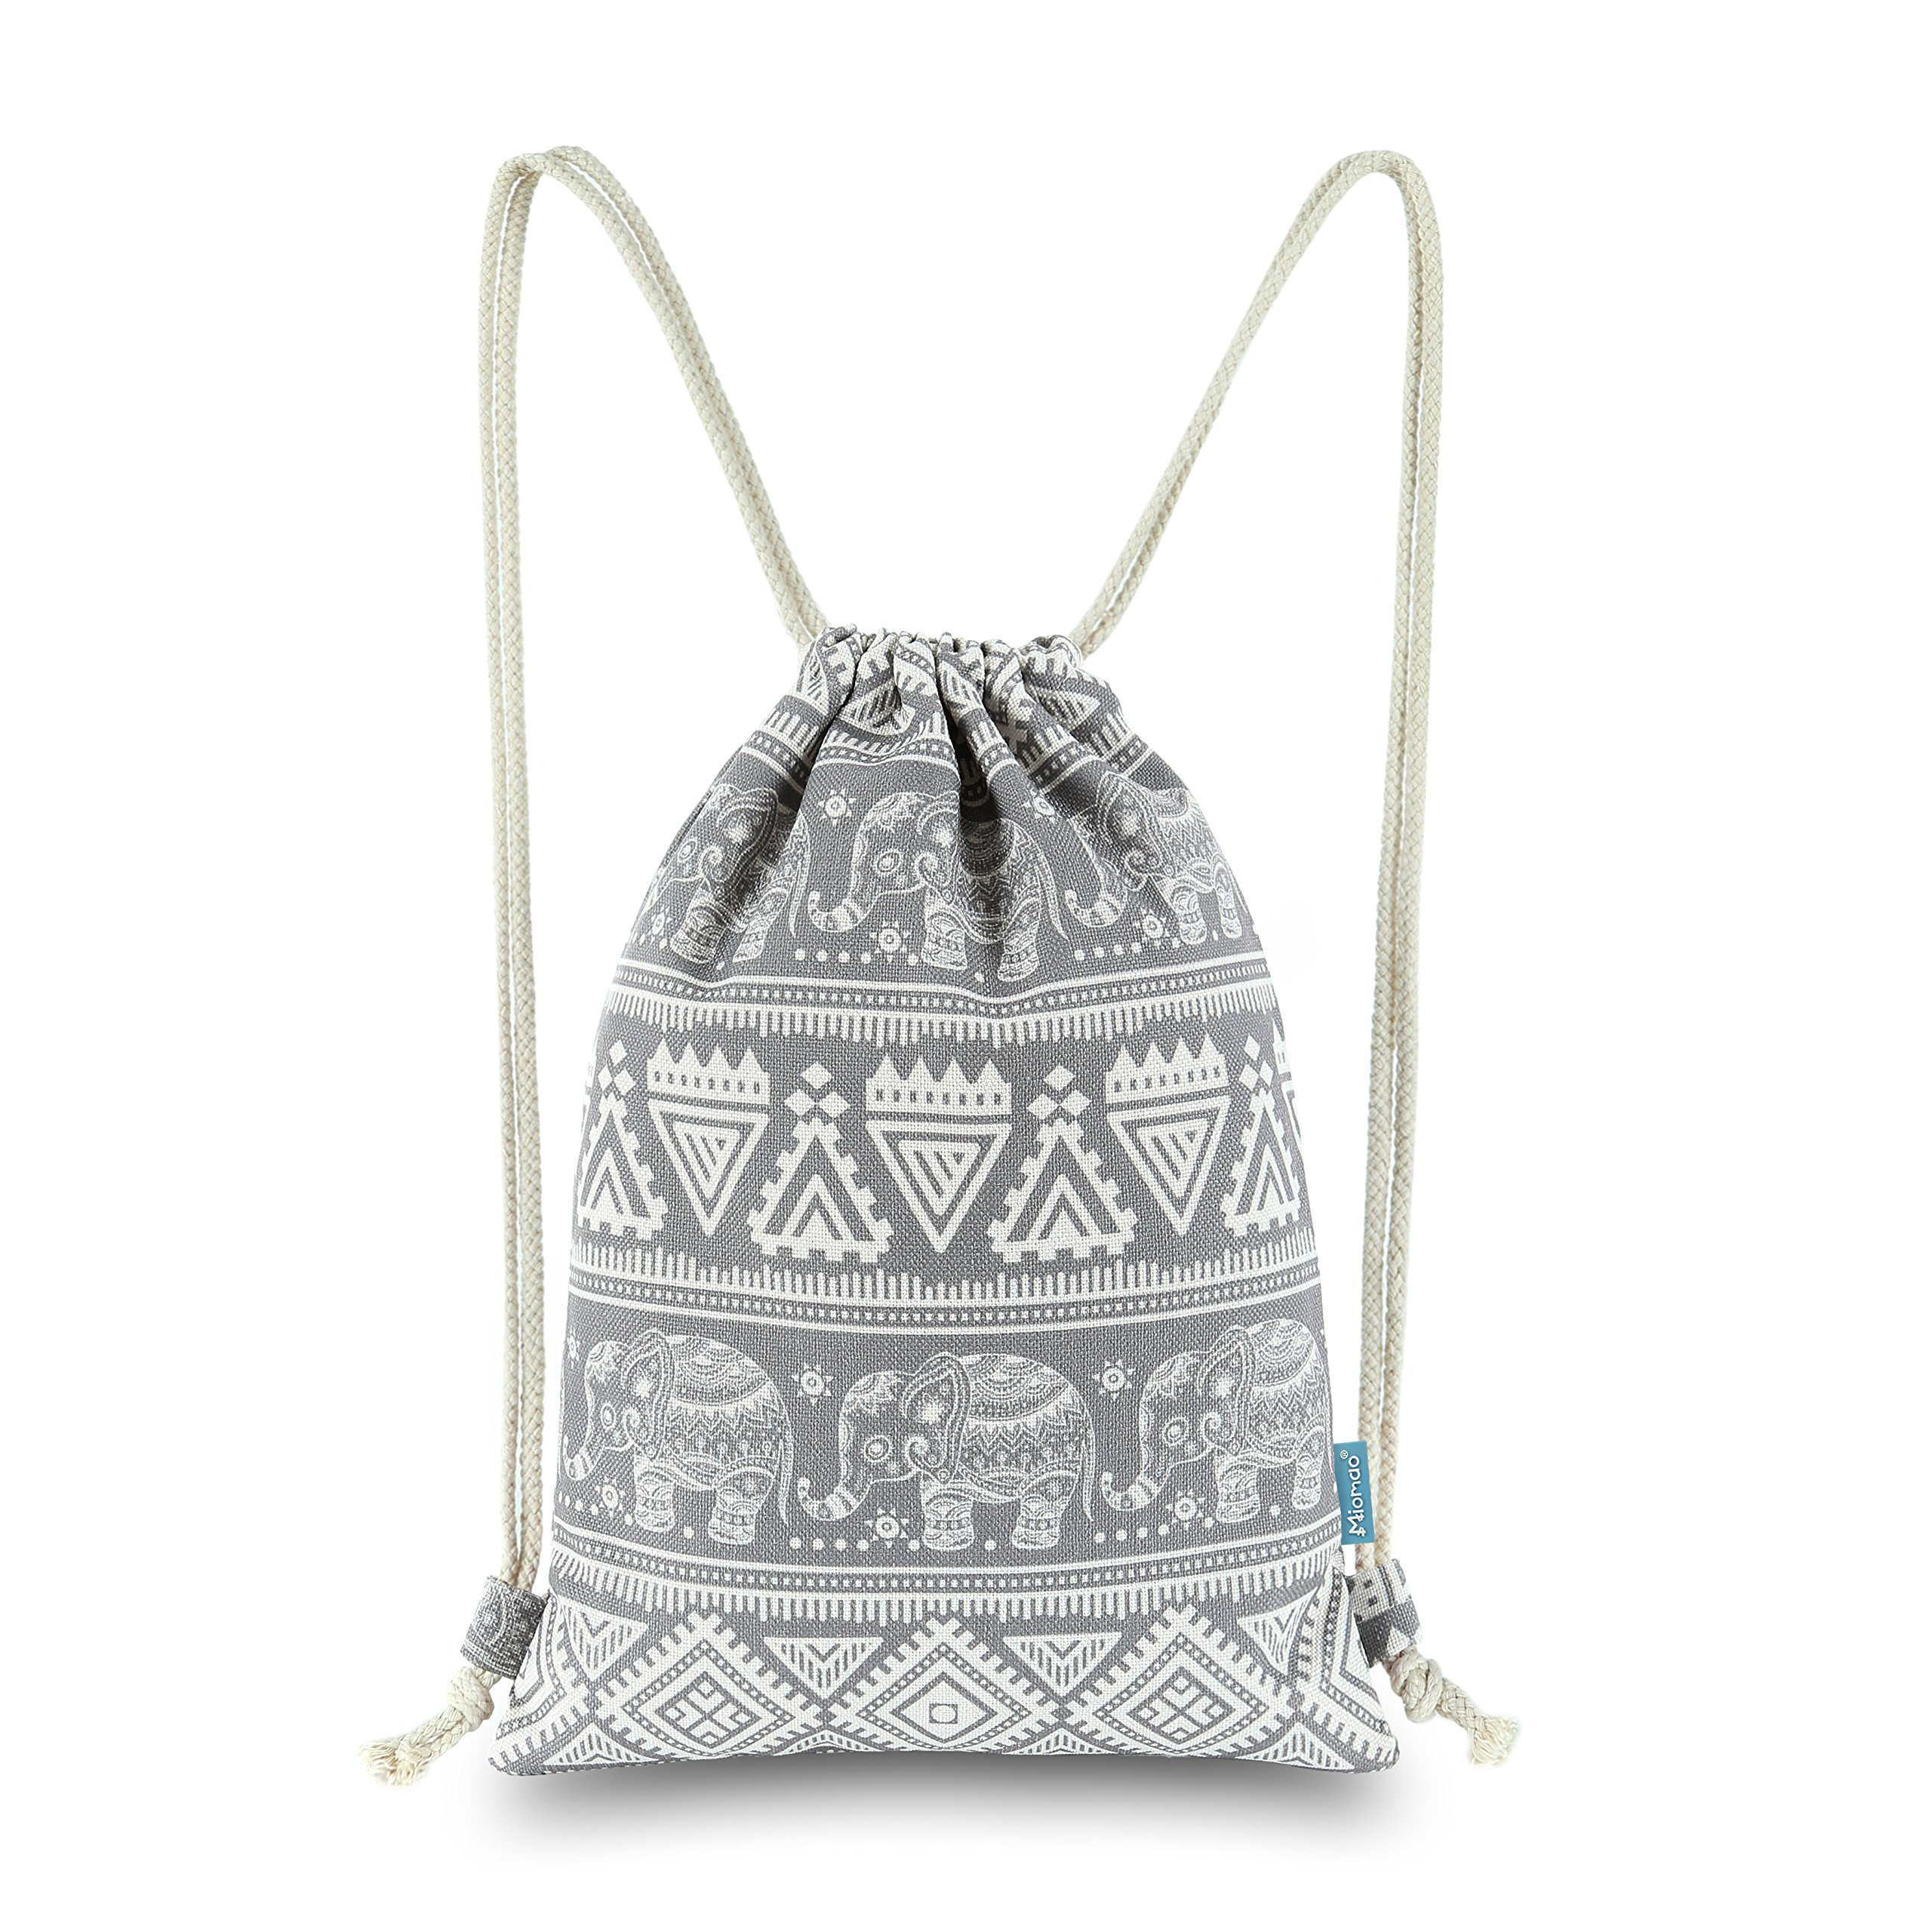 Miomao Drawstring Backpack Elephant String Bag Geometric Gym Sackpack Canvas Sinch Sack Sport Cinch Bag Yoga Daypack Beach Gift Bag For Men & Women 13 X 18 Inches Grey